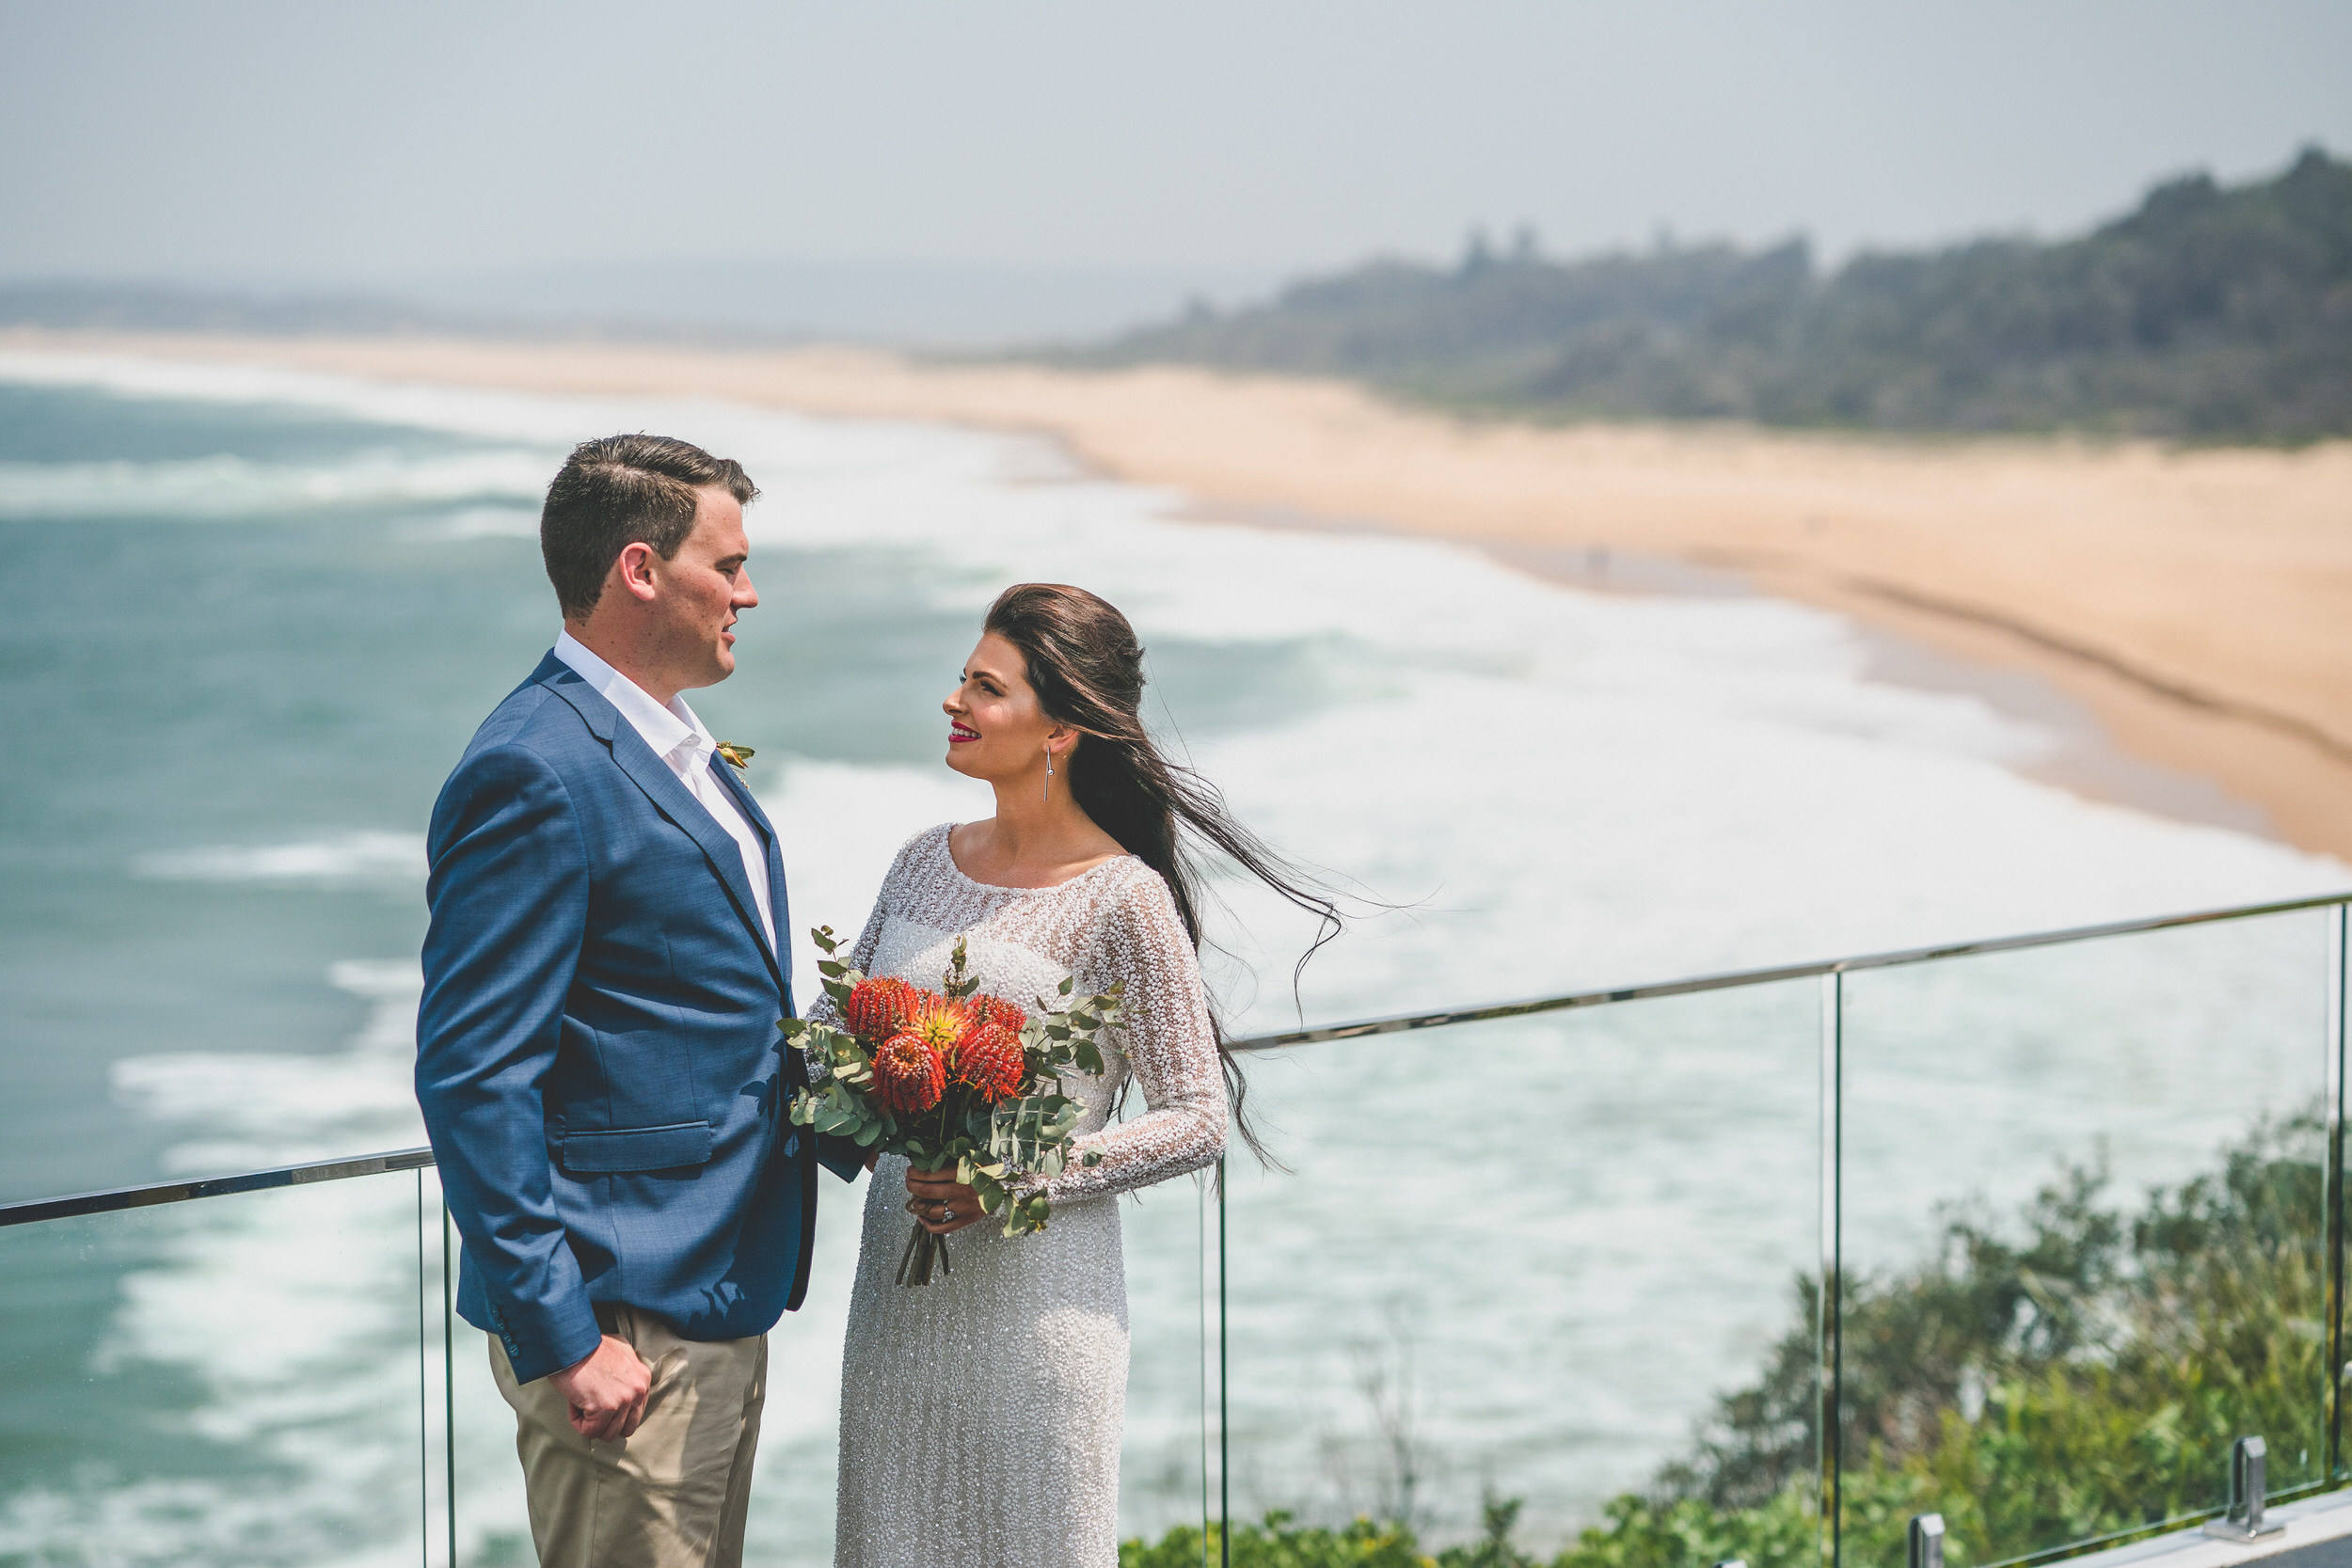 Culburra wedding overlooking the beach